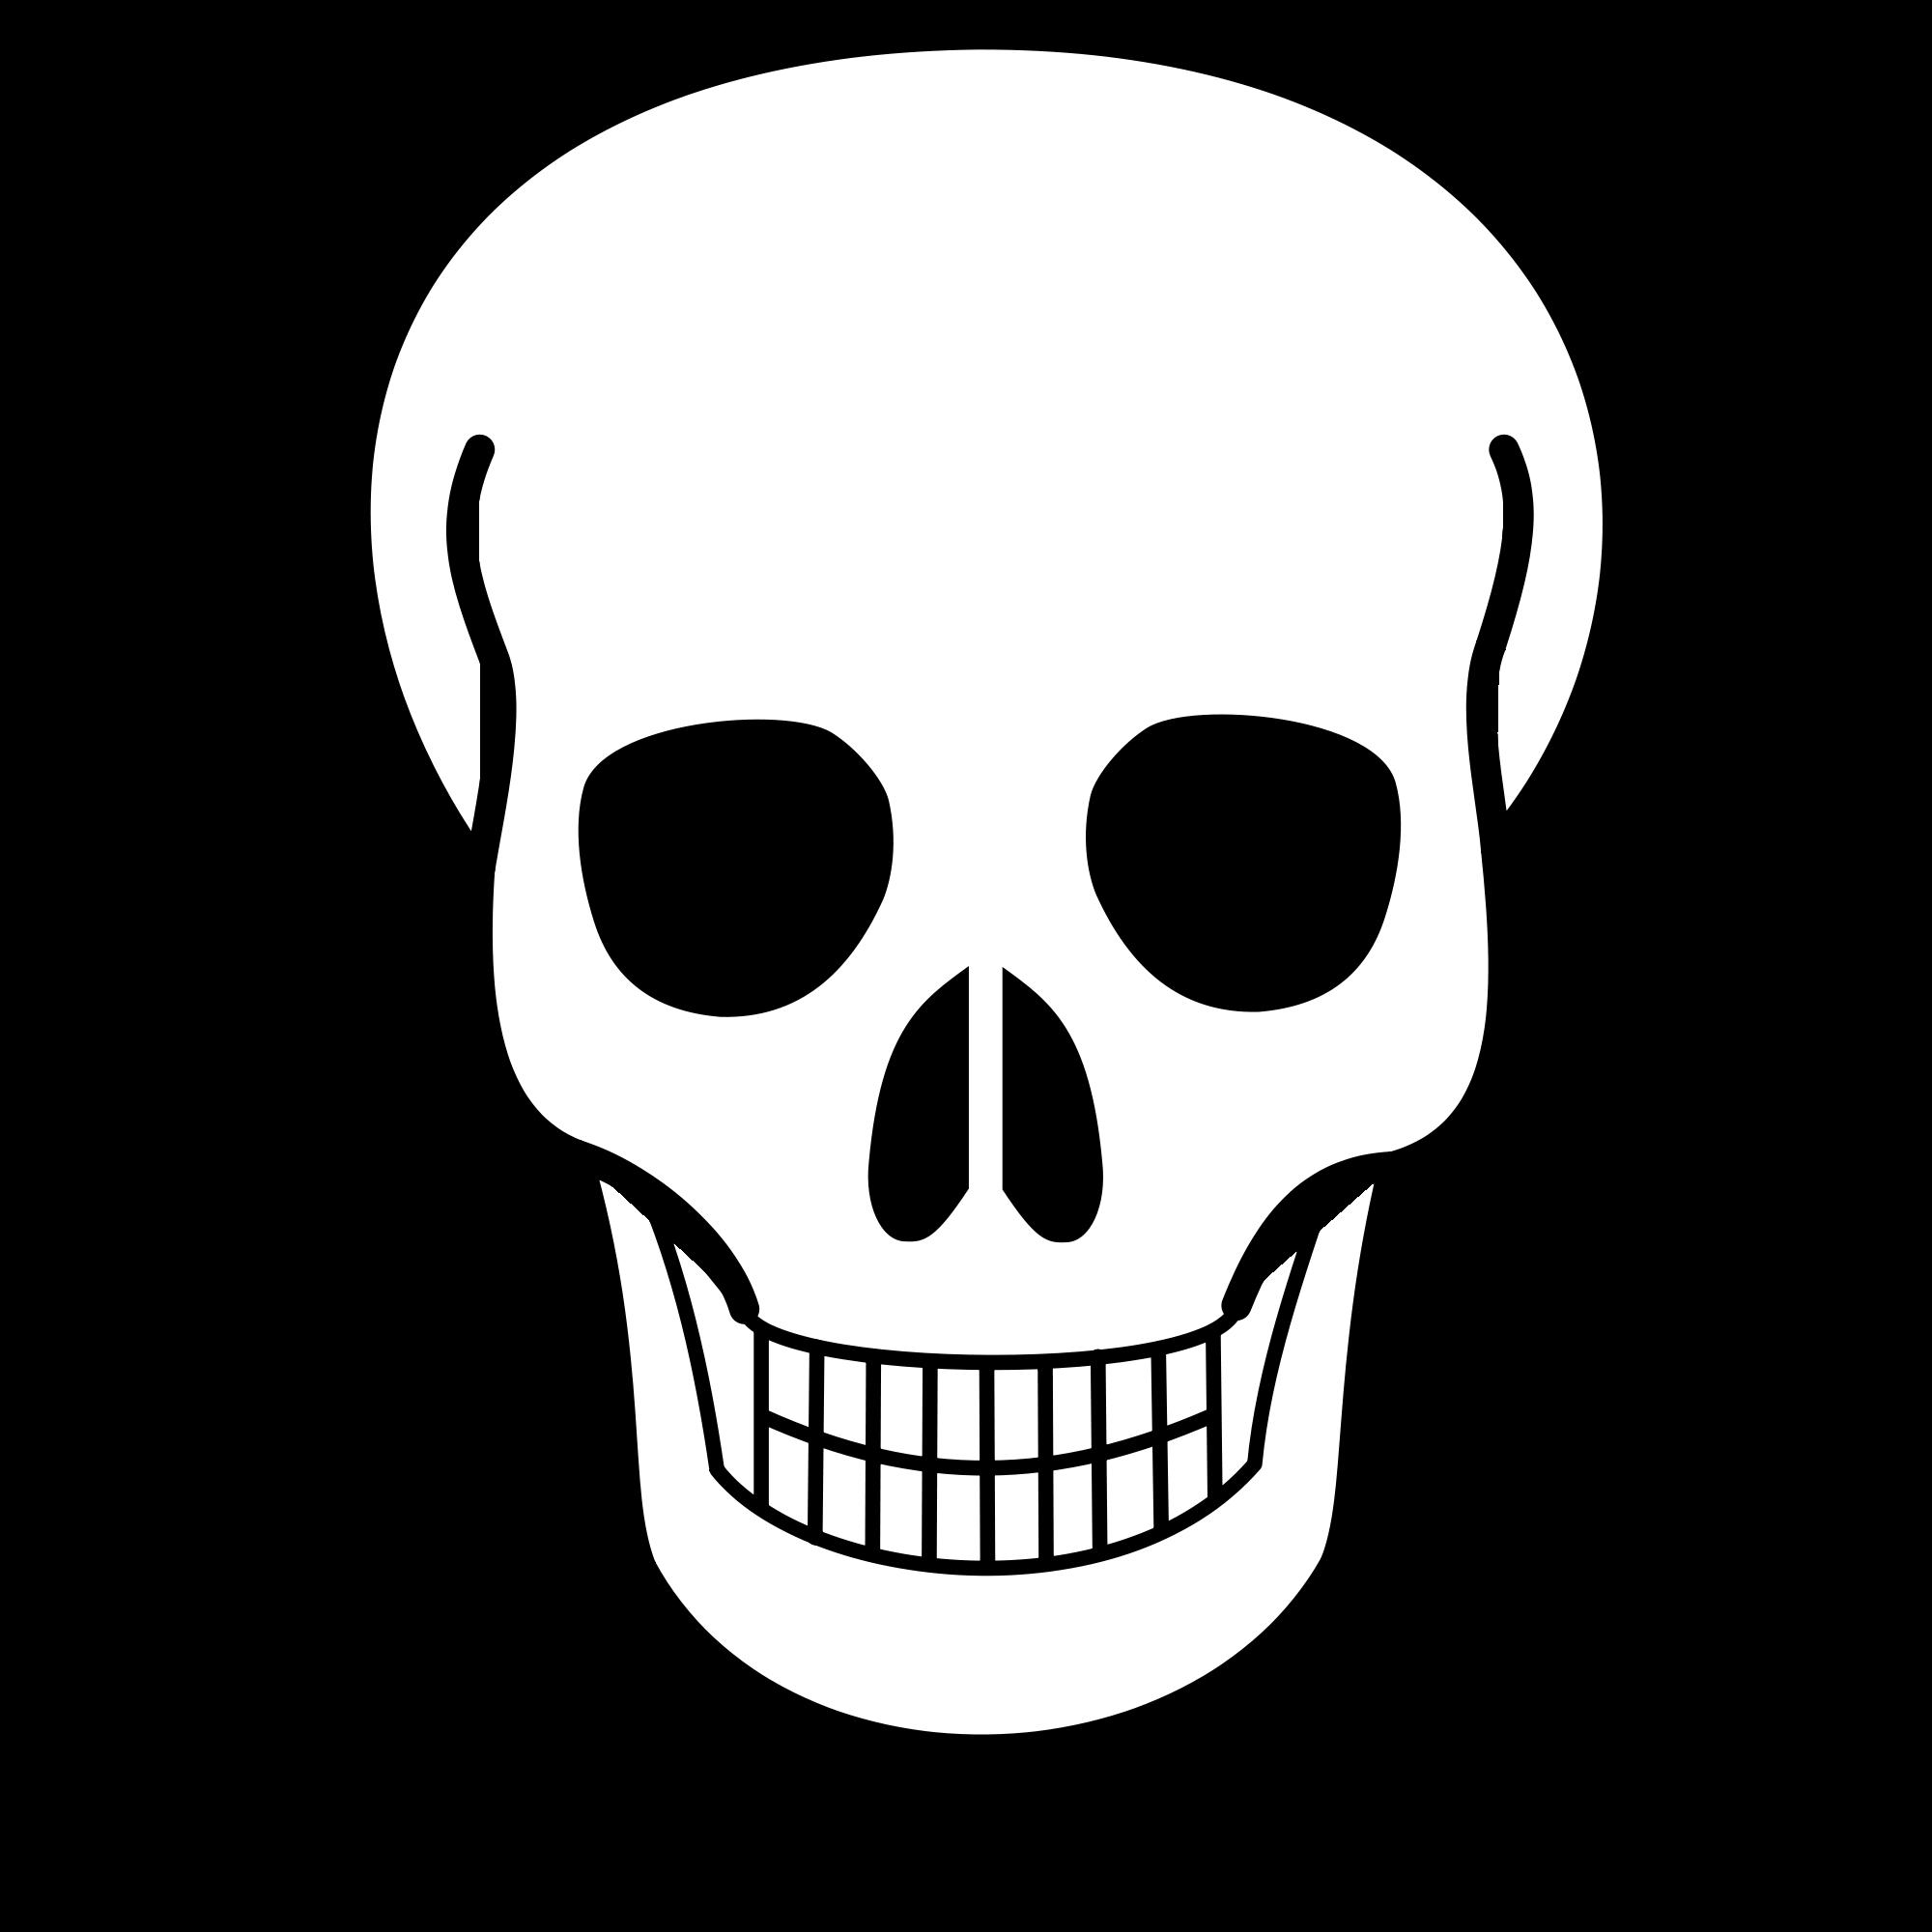 banner black and white download File skull icon svg. Bones vector simple